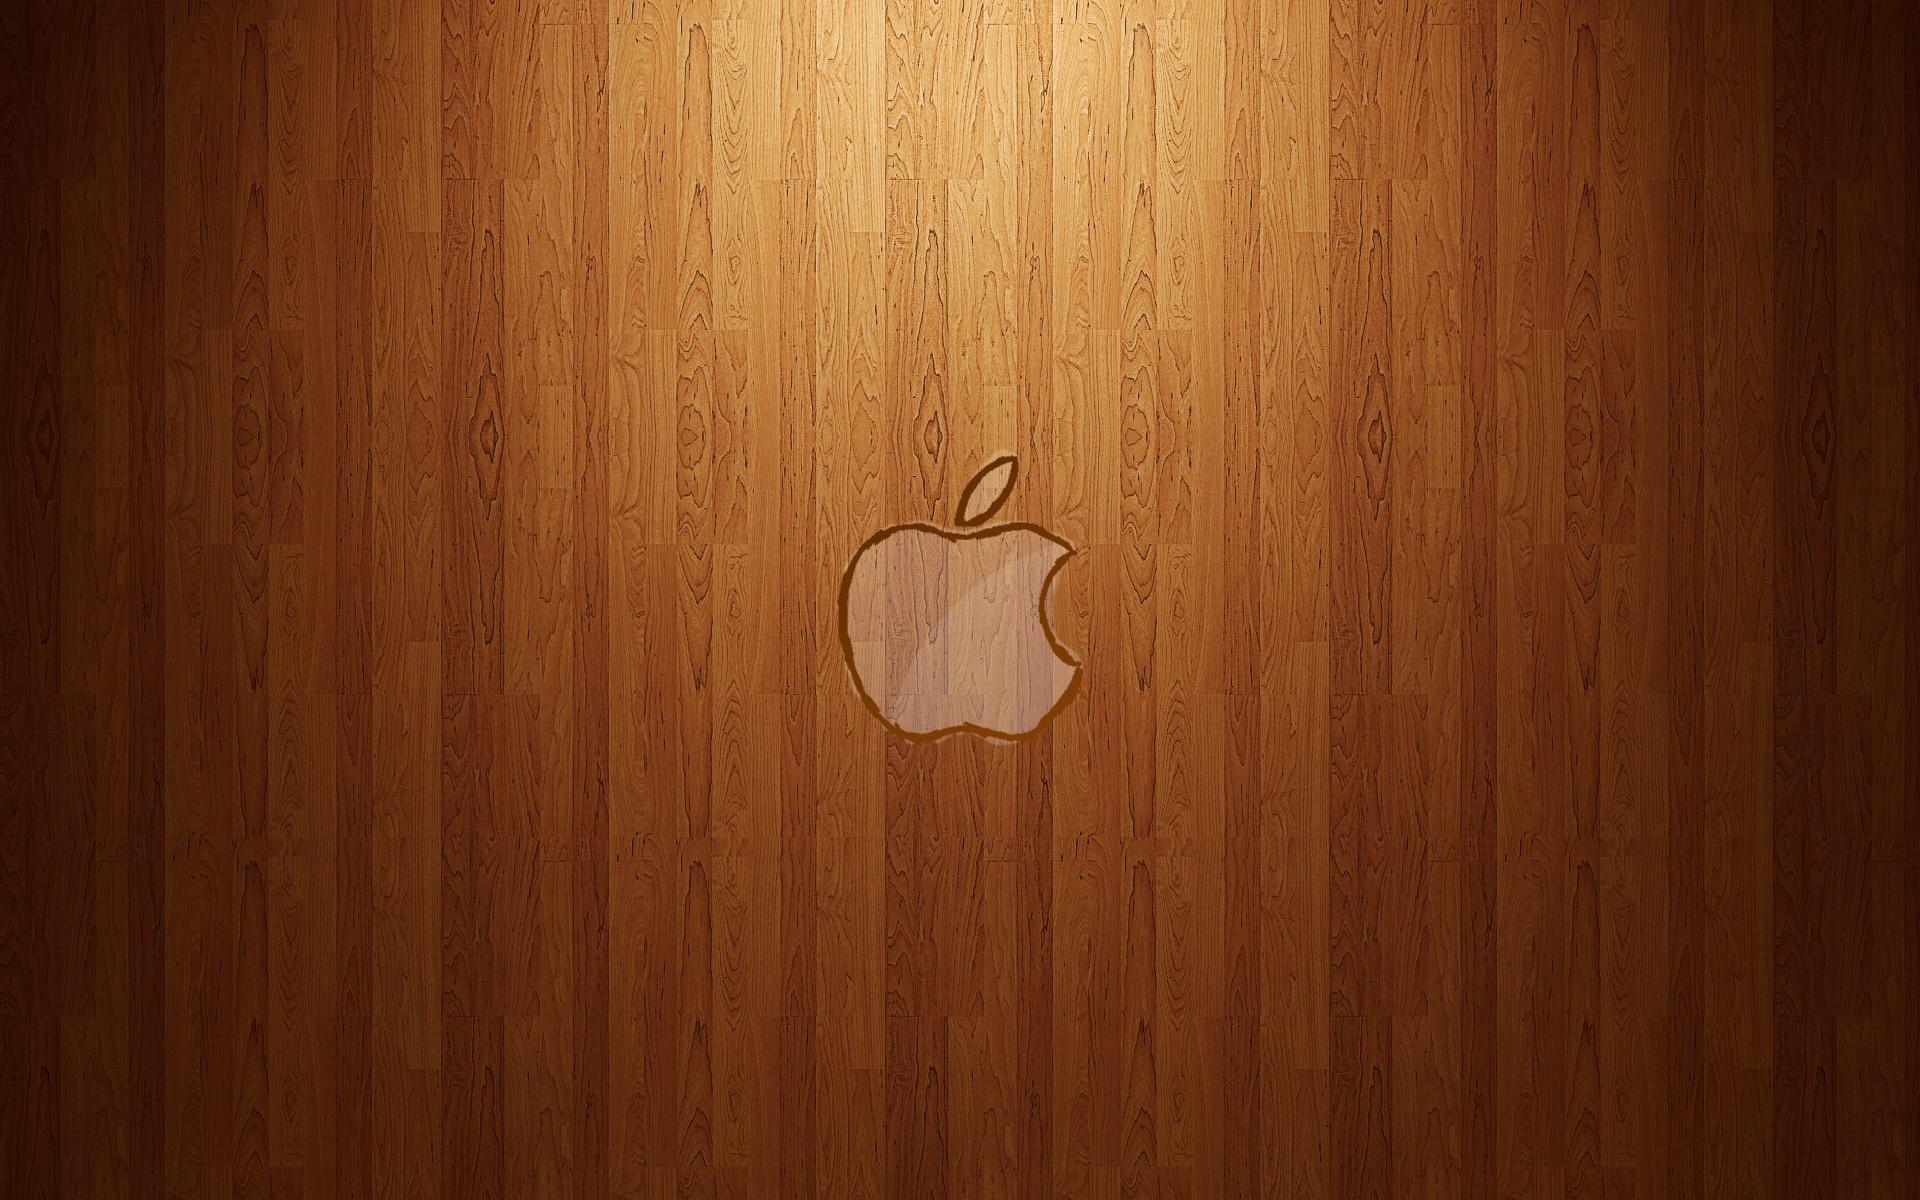 Mac Wallpapers HD